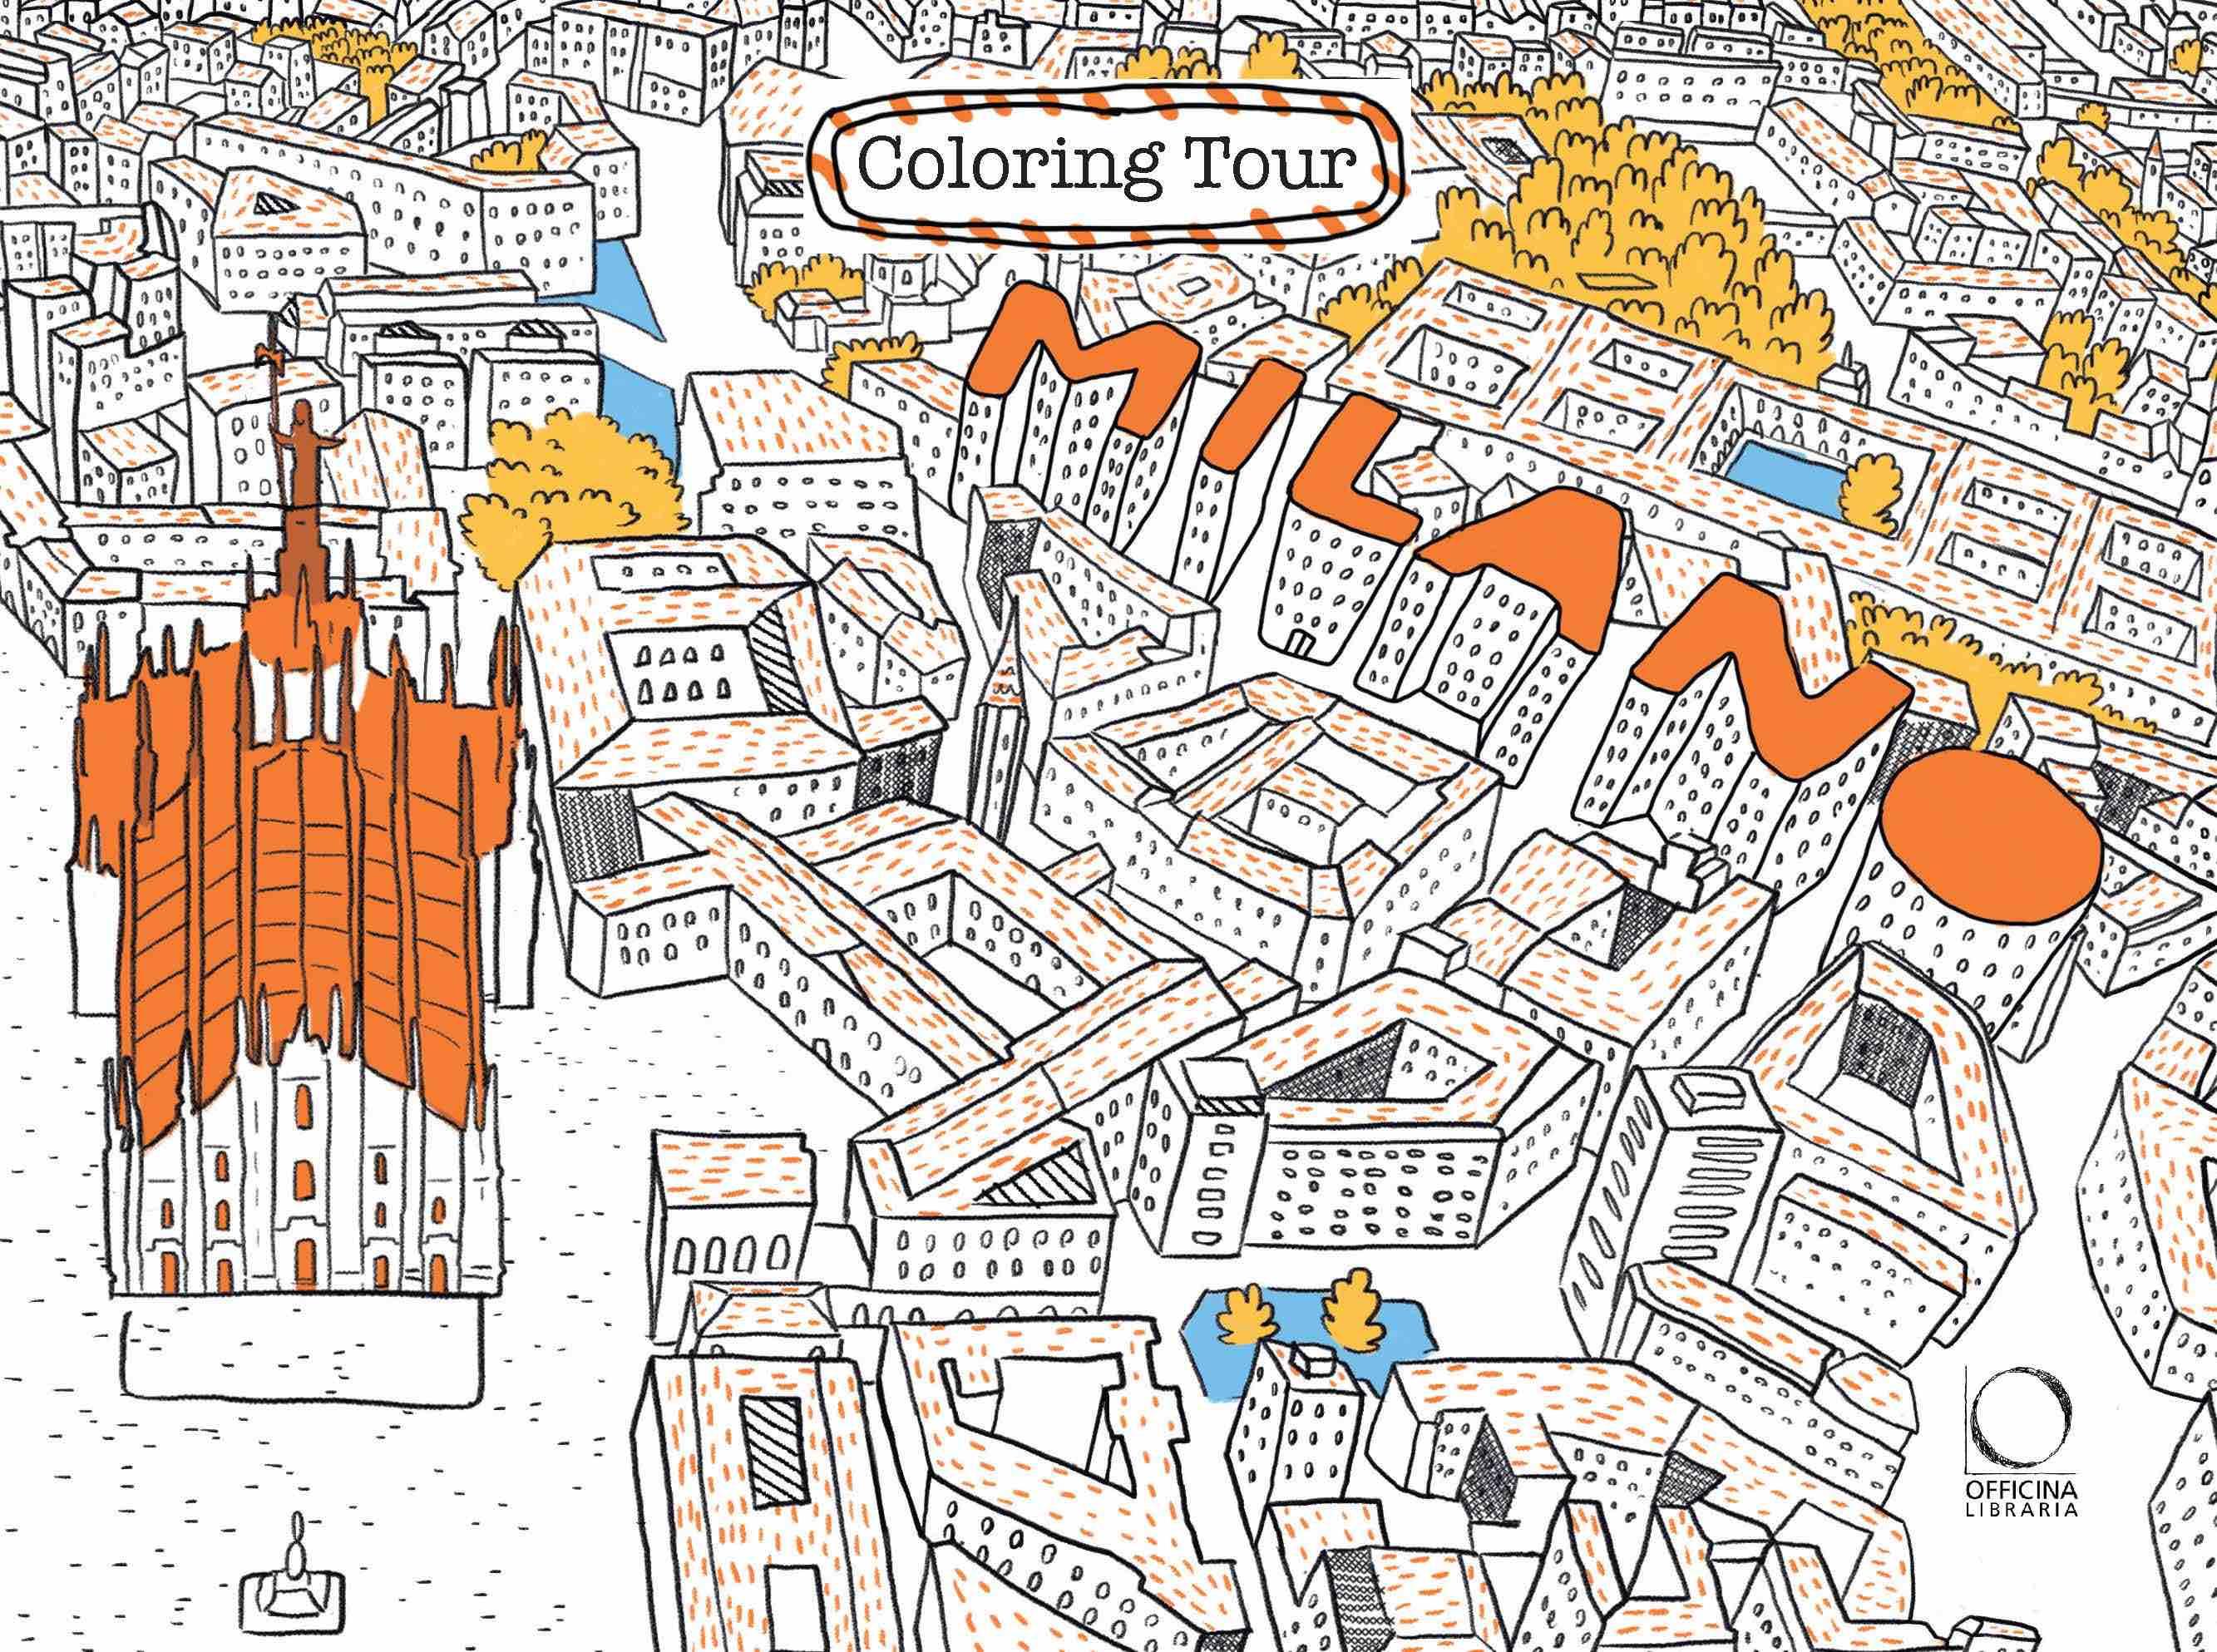 Coloring tour